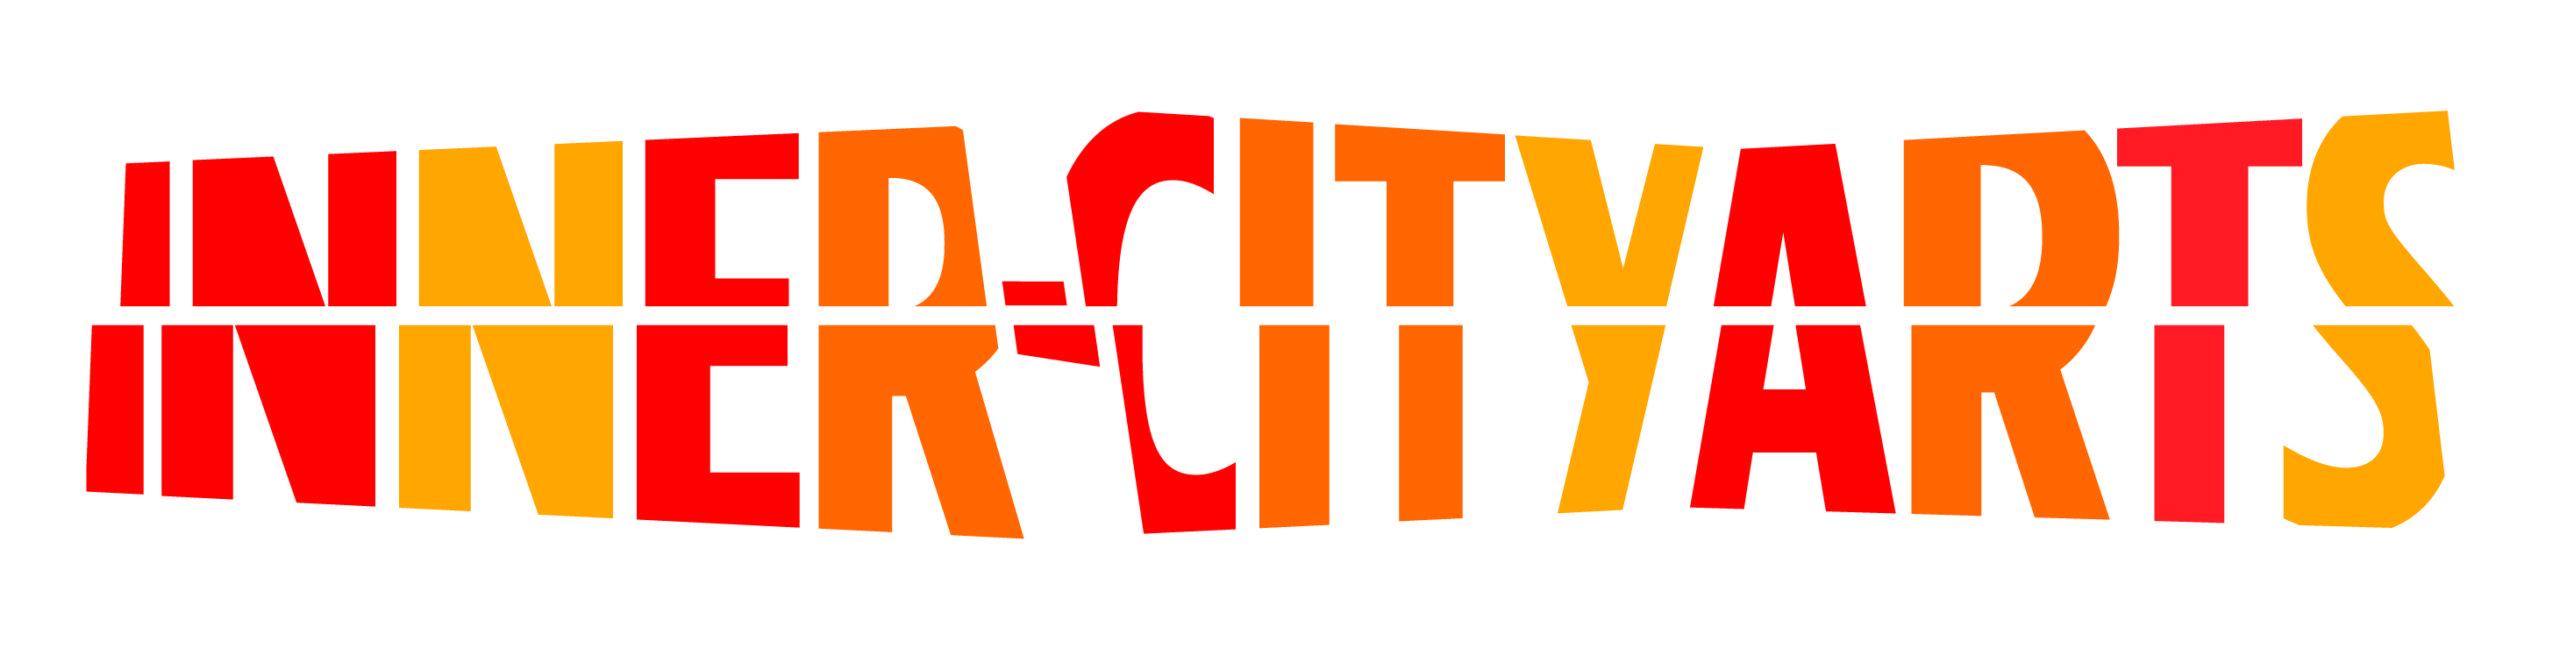 Inner-City Arts